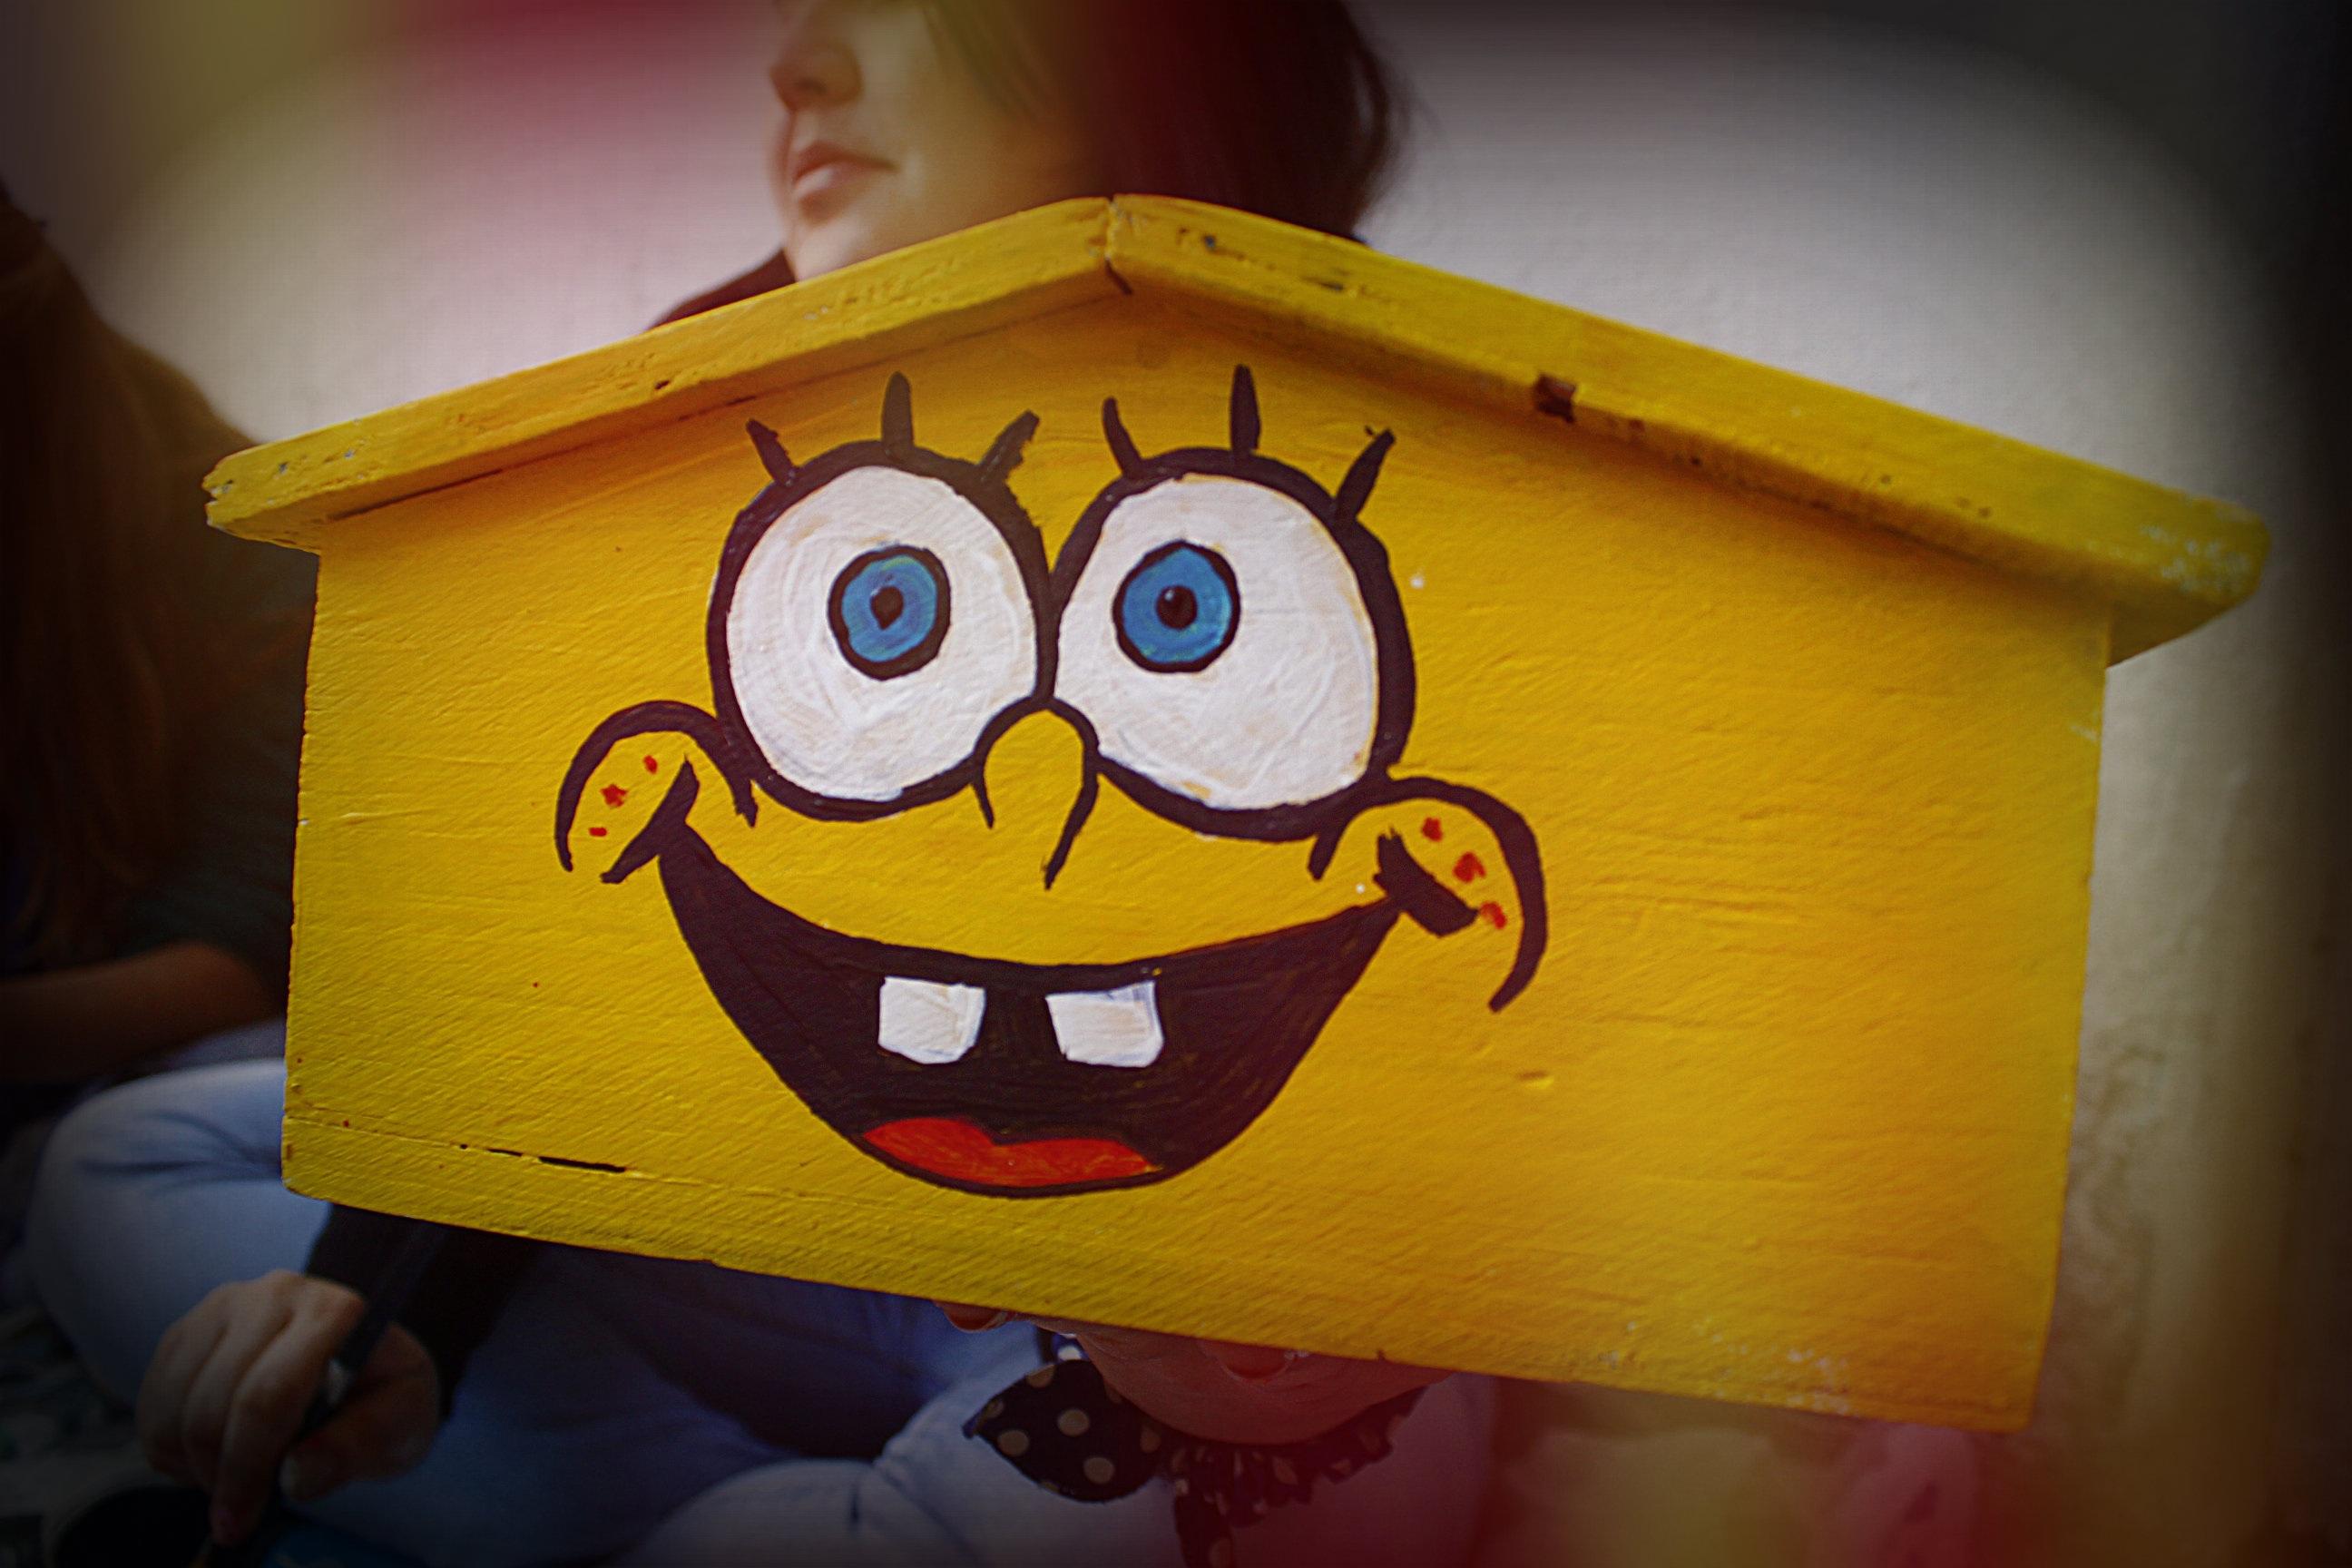 Gambar Rumah Plafon Warna Kuning Mainan Masa Kecil Seni